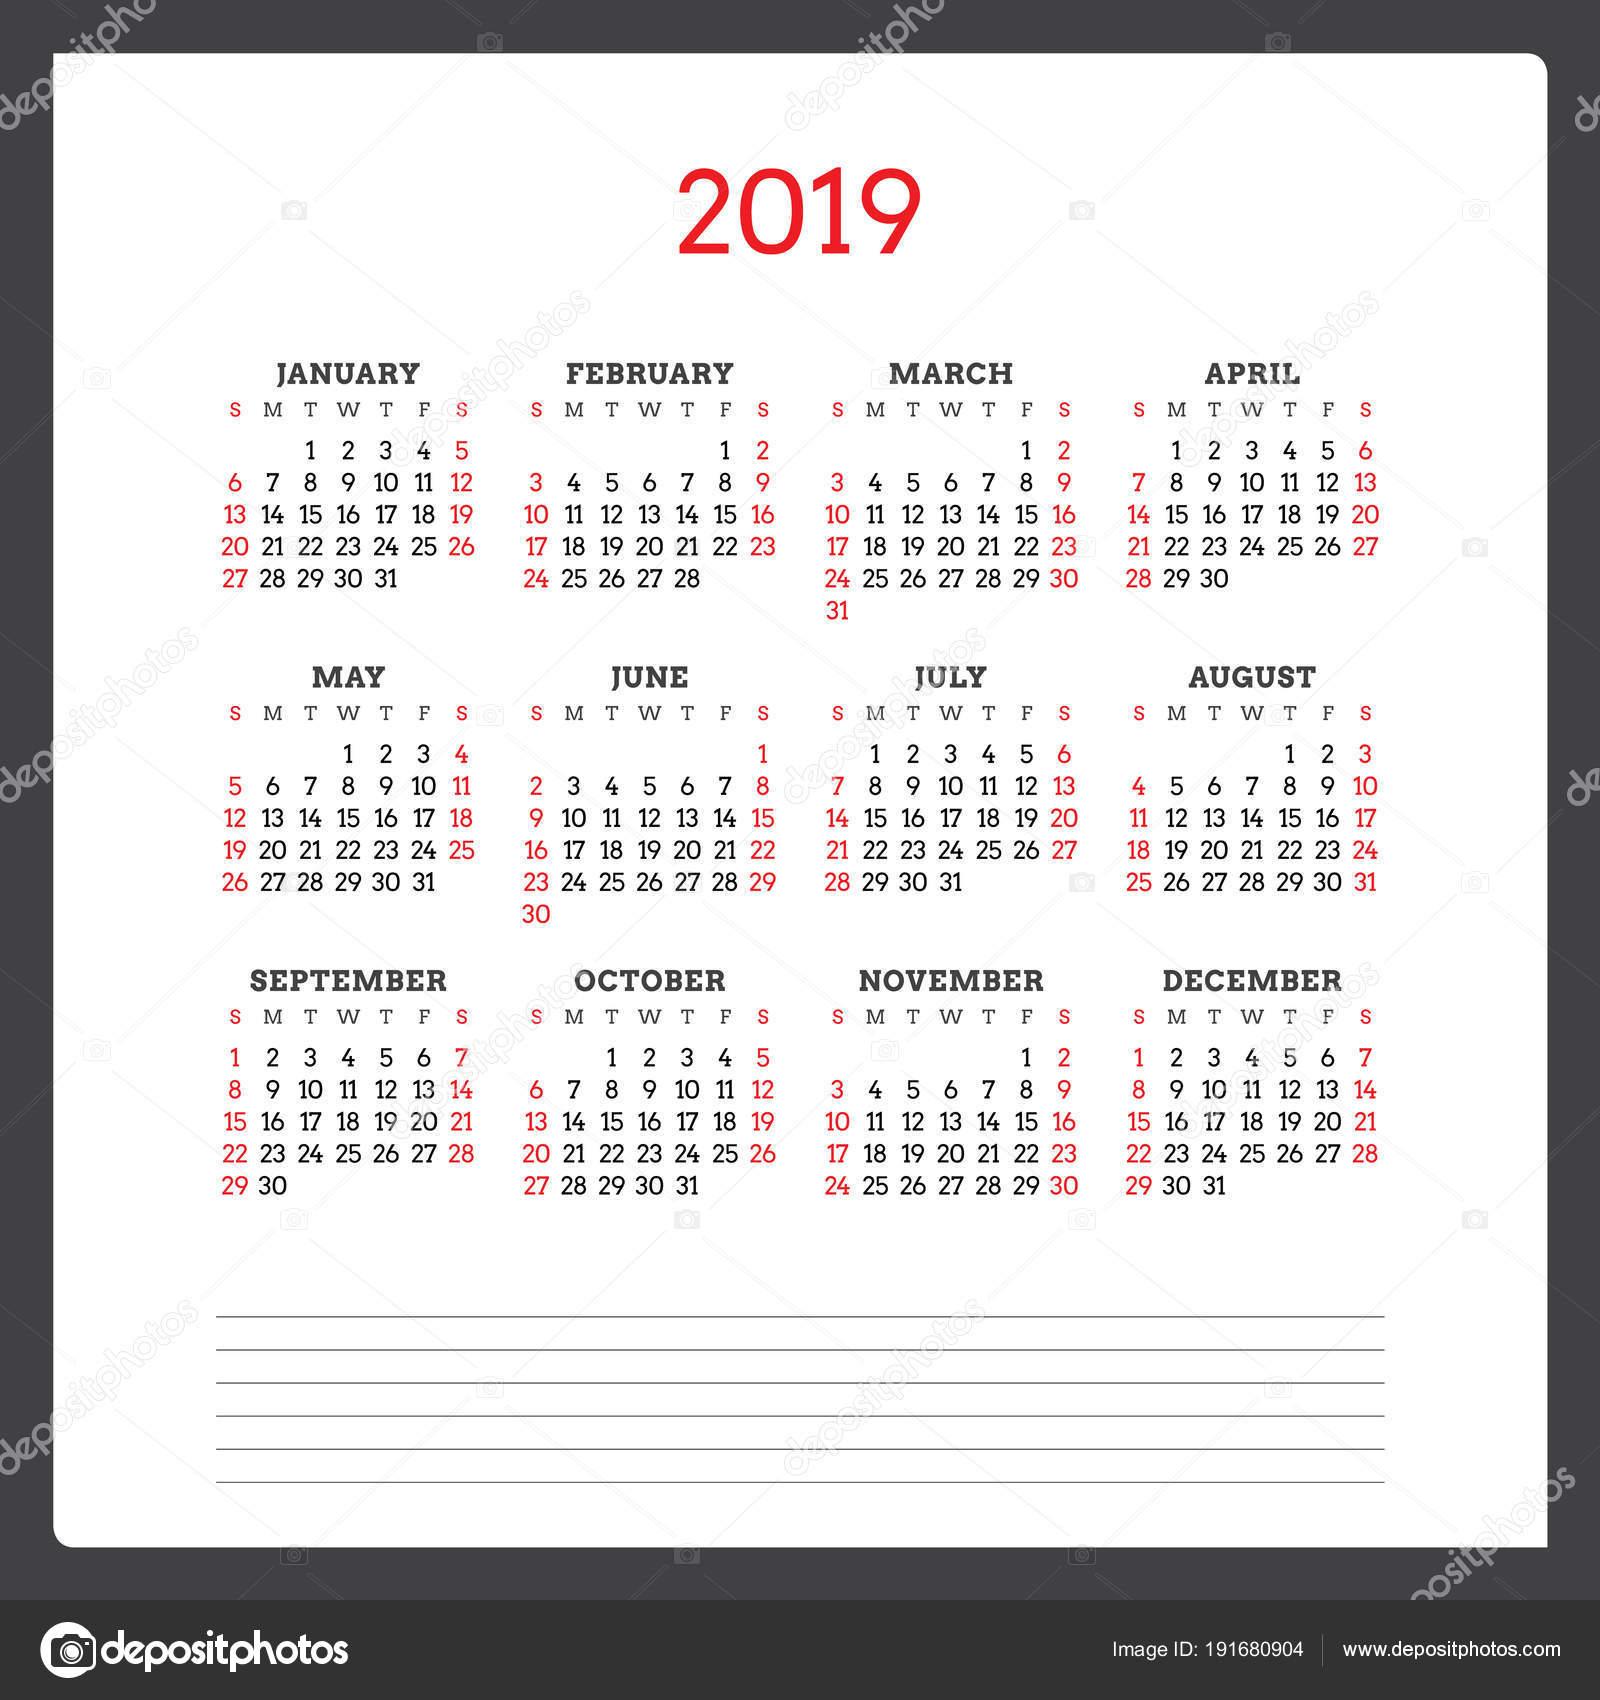 Calendario 2019 Con Numero Week.Calendar For 2019 Year Week Starts On Sunday Printable